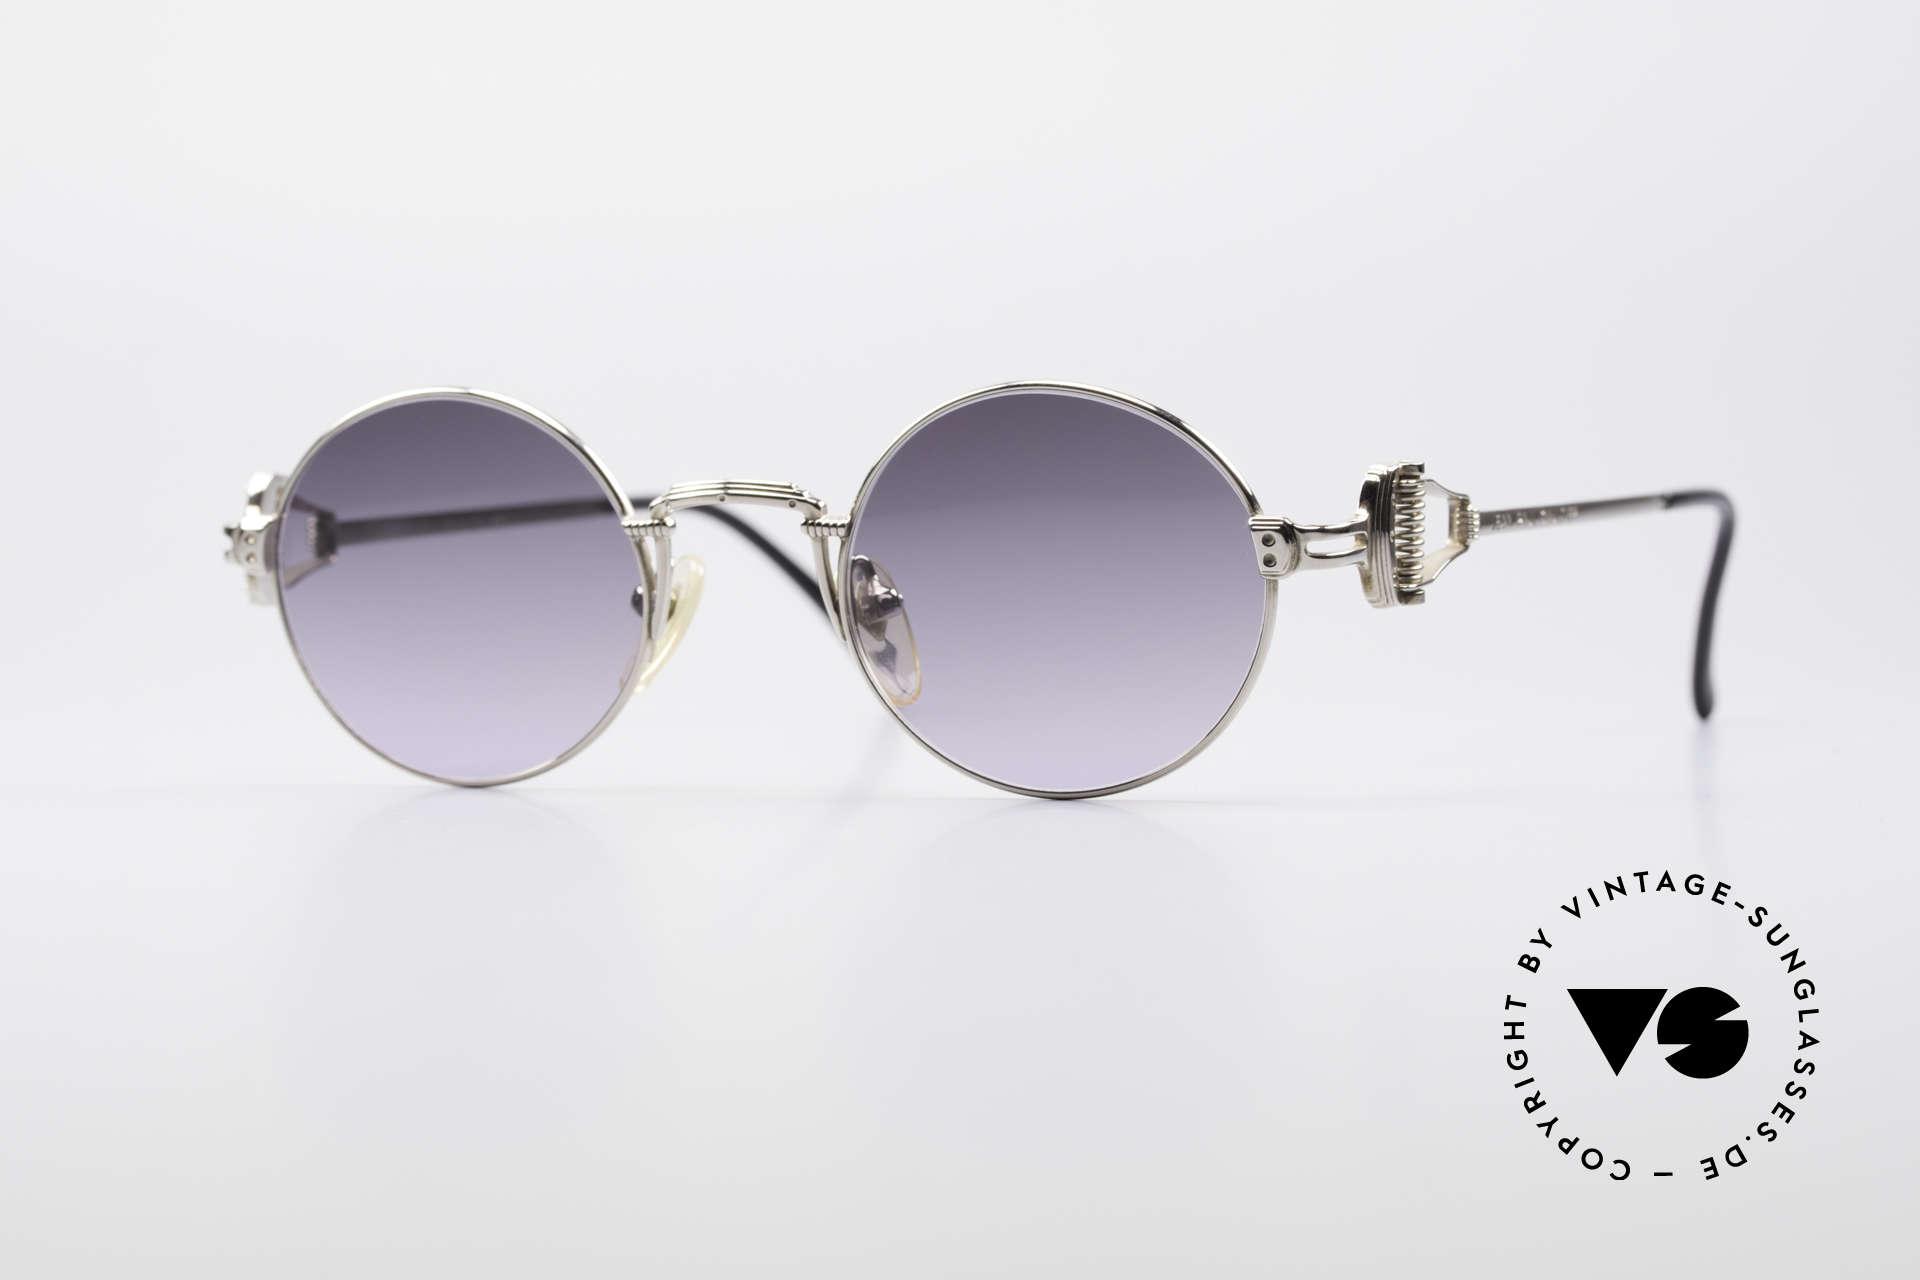 Jean Paul Gaultier 55-5106 Steampunk Sunglasses, precious Jean Paul GAULTIER sunglasses from app. 1994, Made for Men and Women